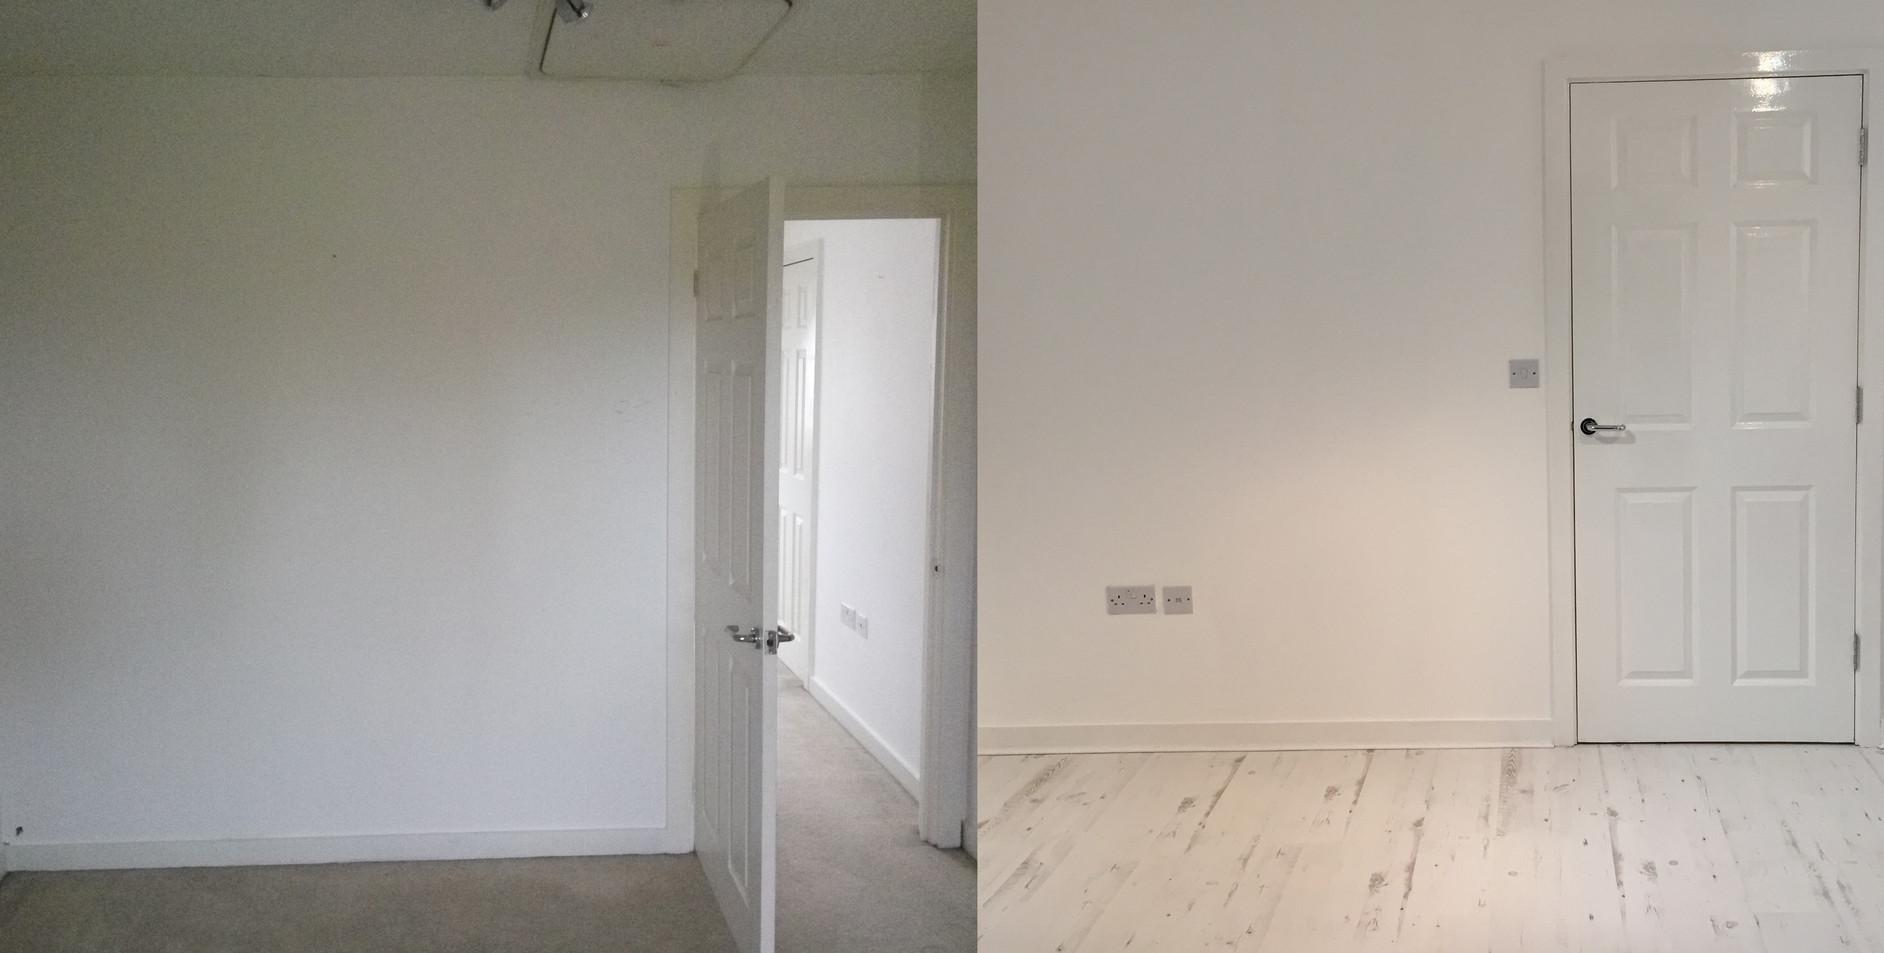 Bedroom_Before-After.jpg